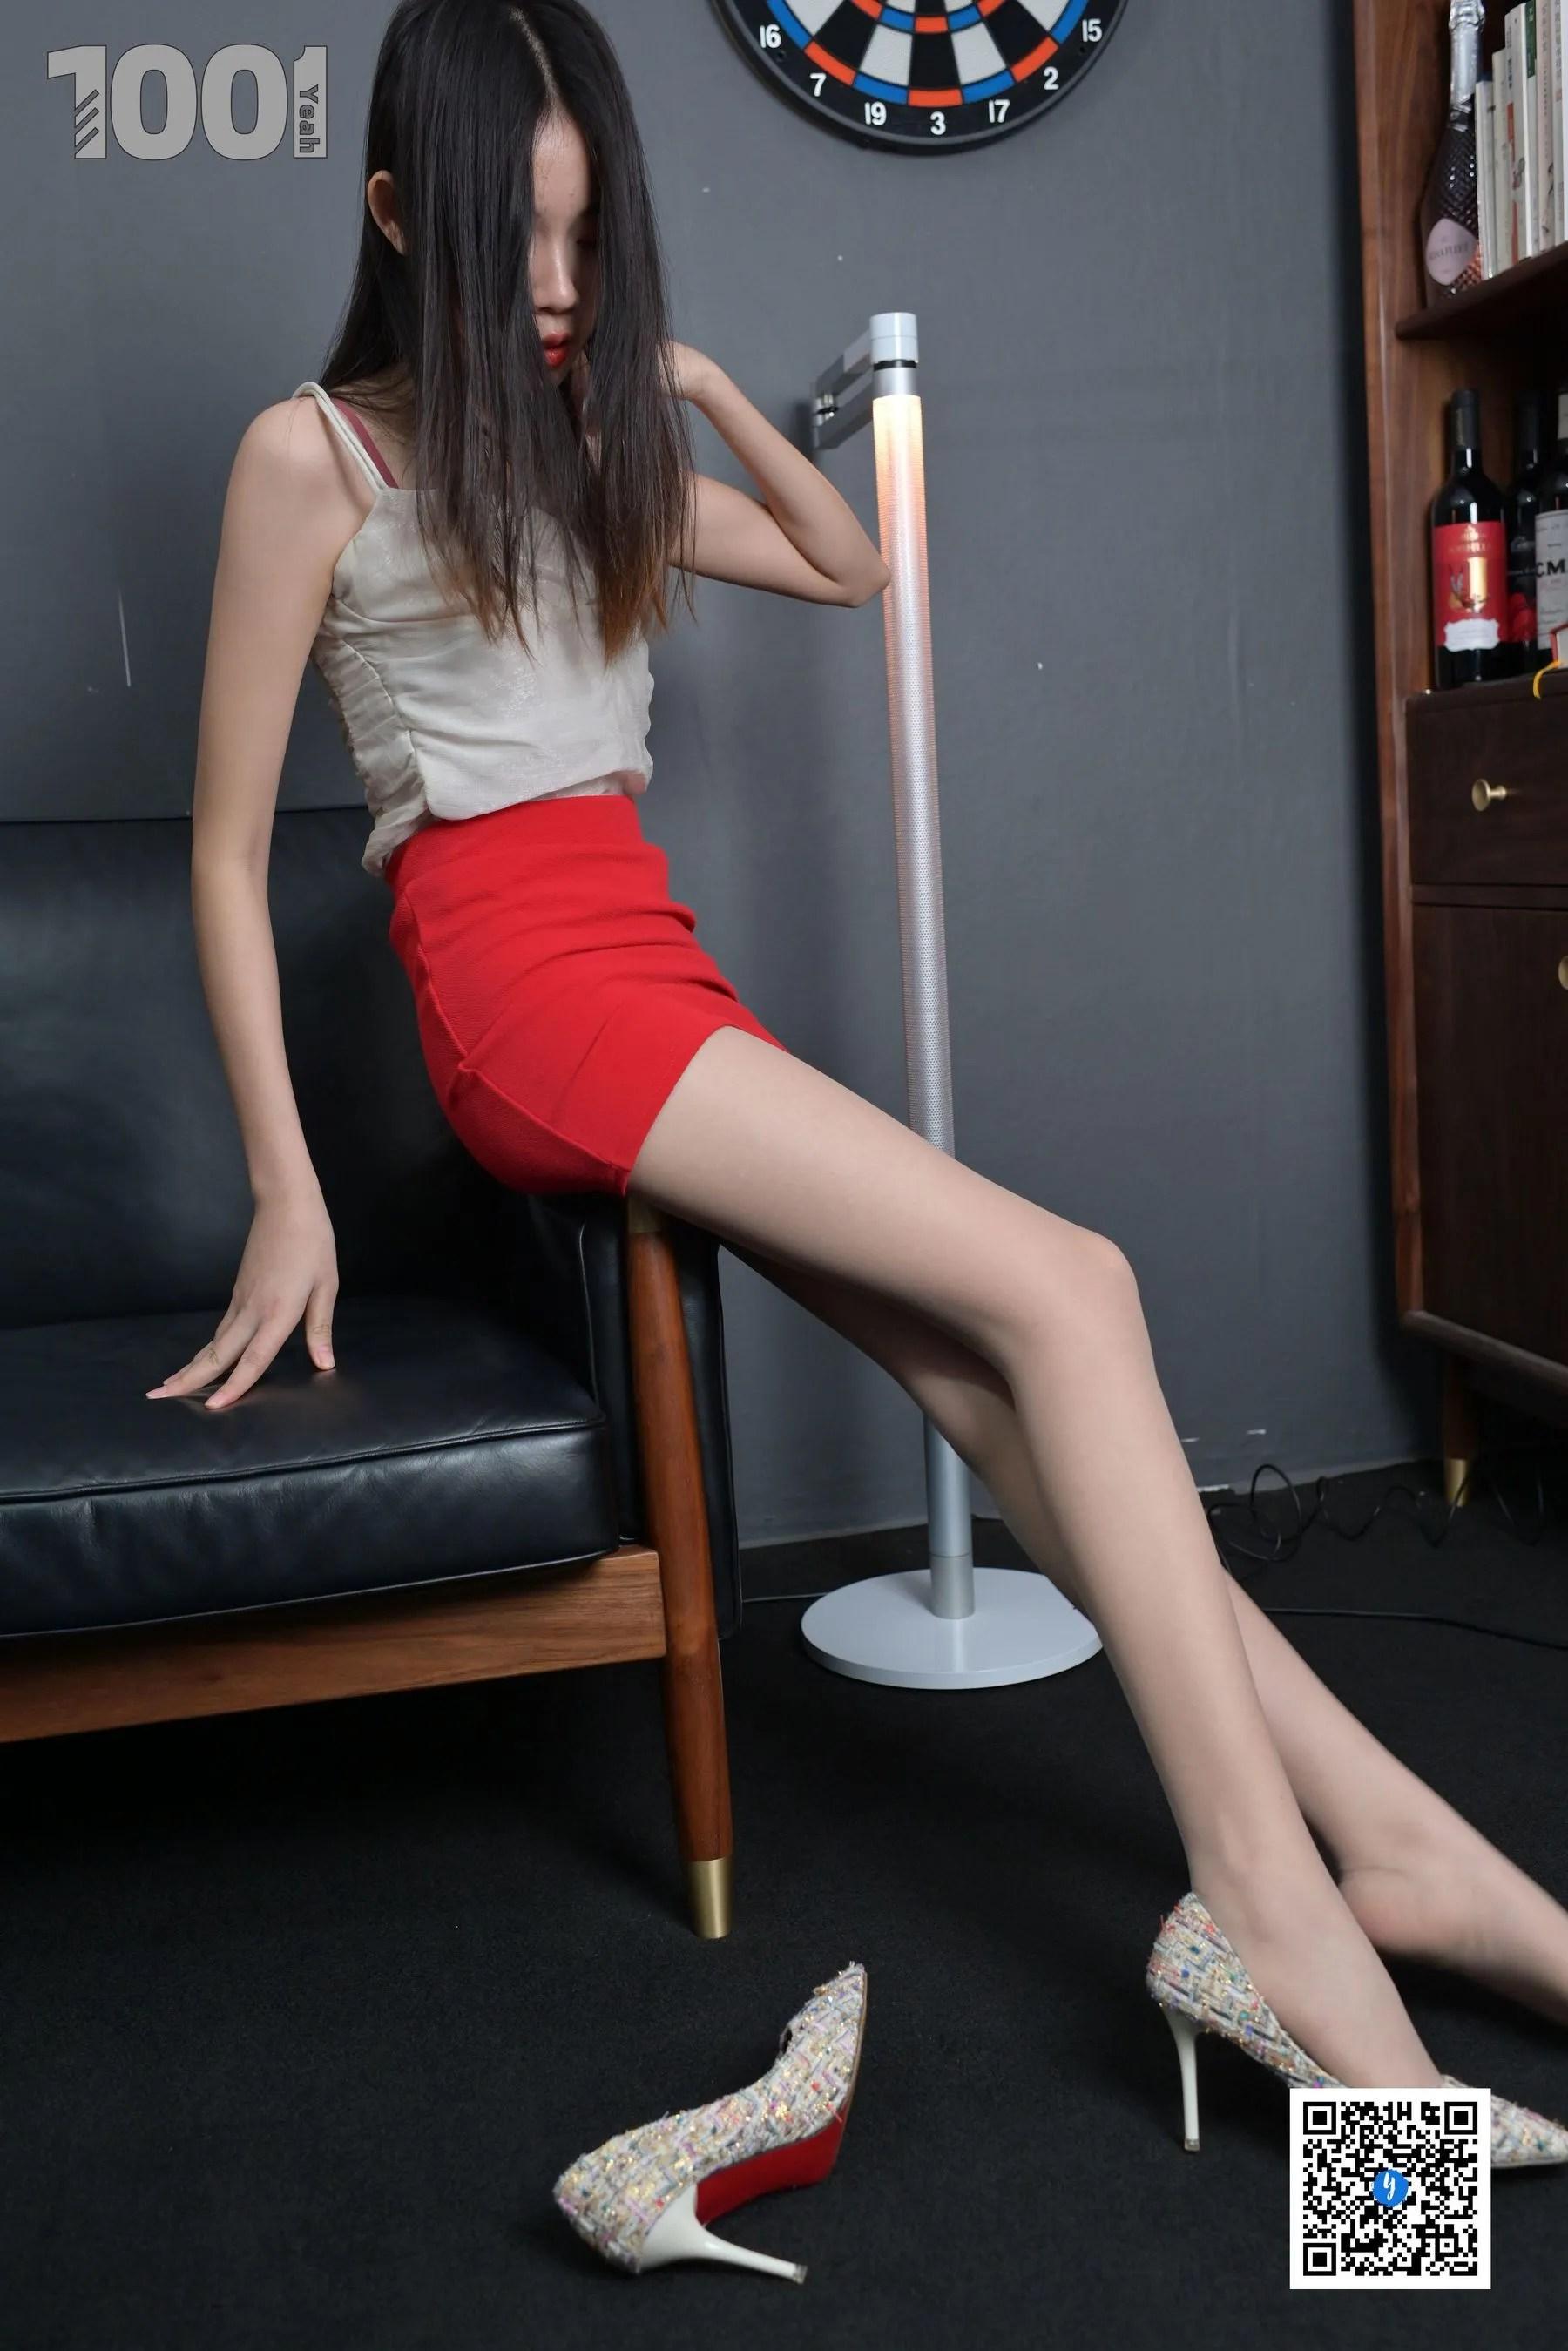 [IESS] NO.189 【一抹红3】  丝足美腿写真[89P]插图(1)